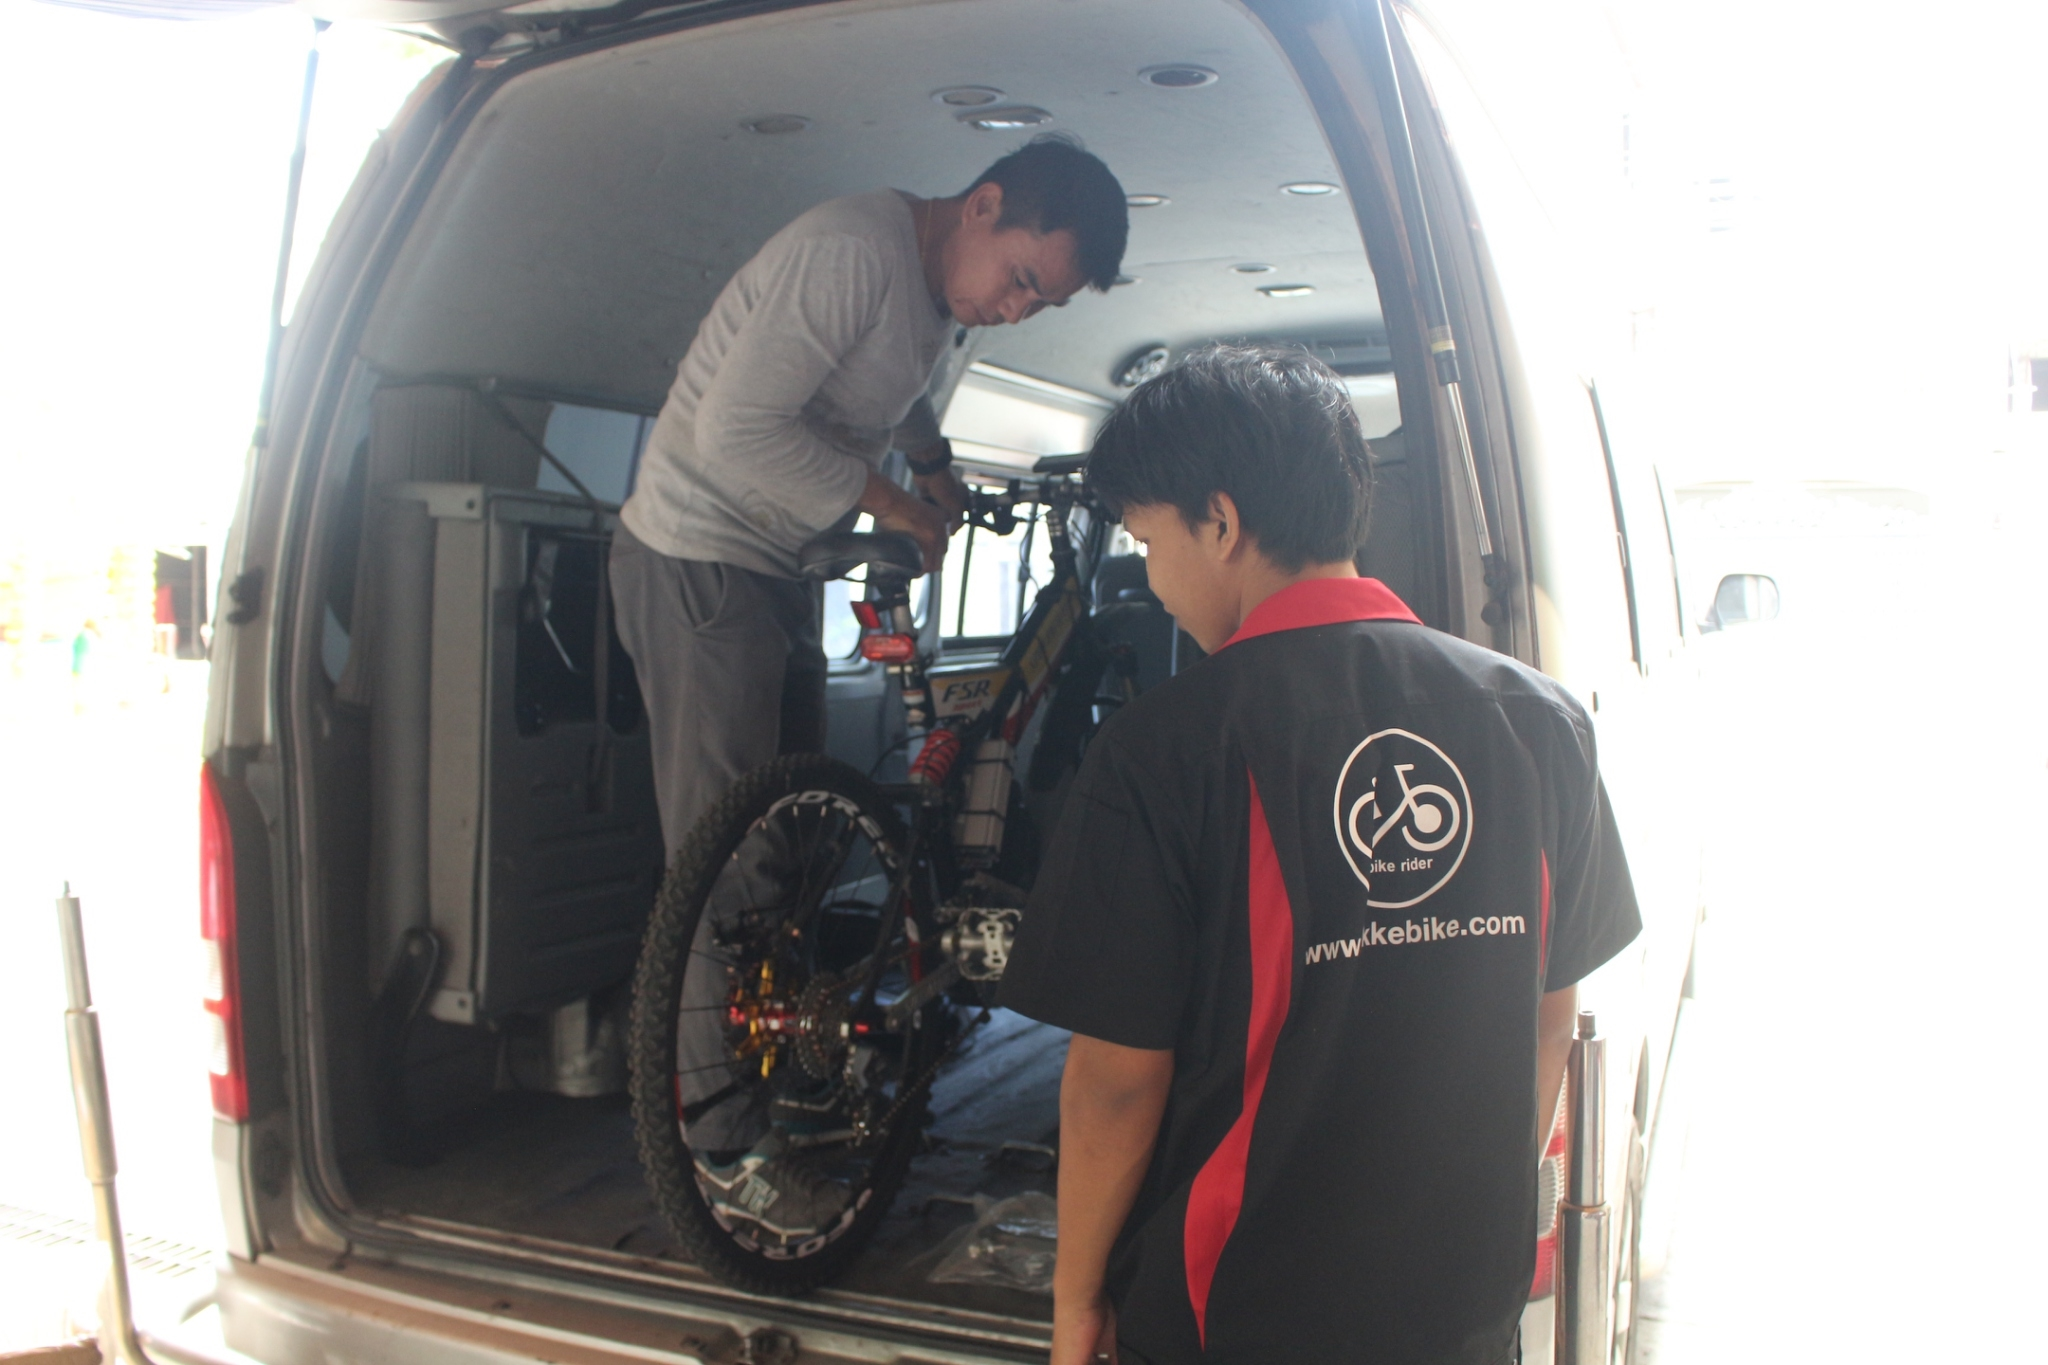 Bangkok E-bike มีบริการติดตั้ง